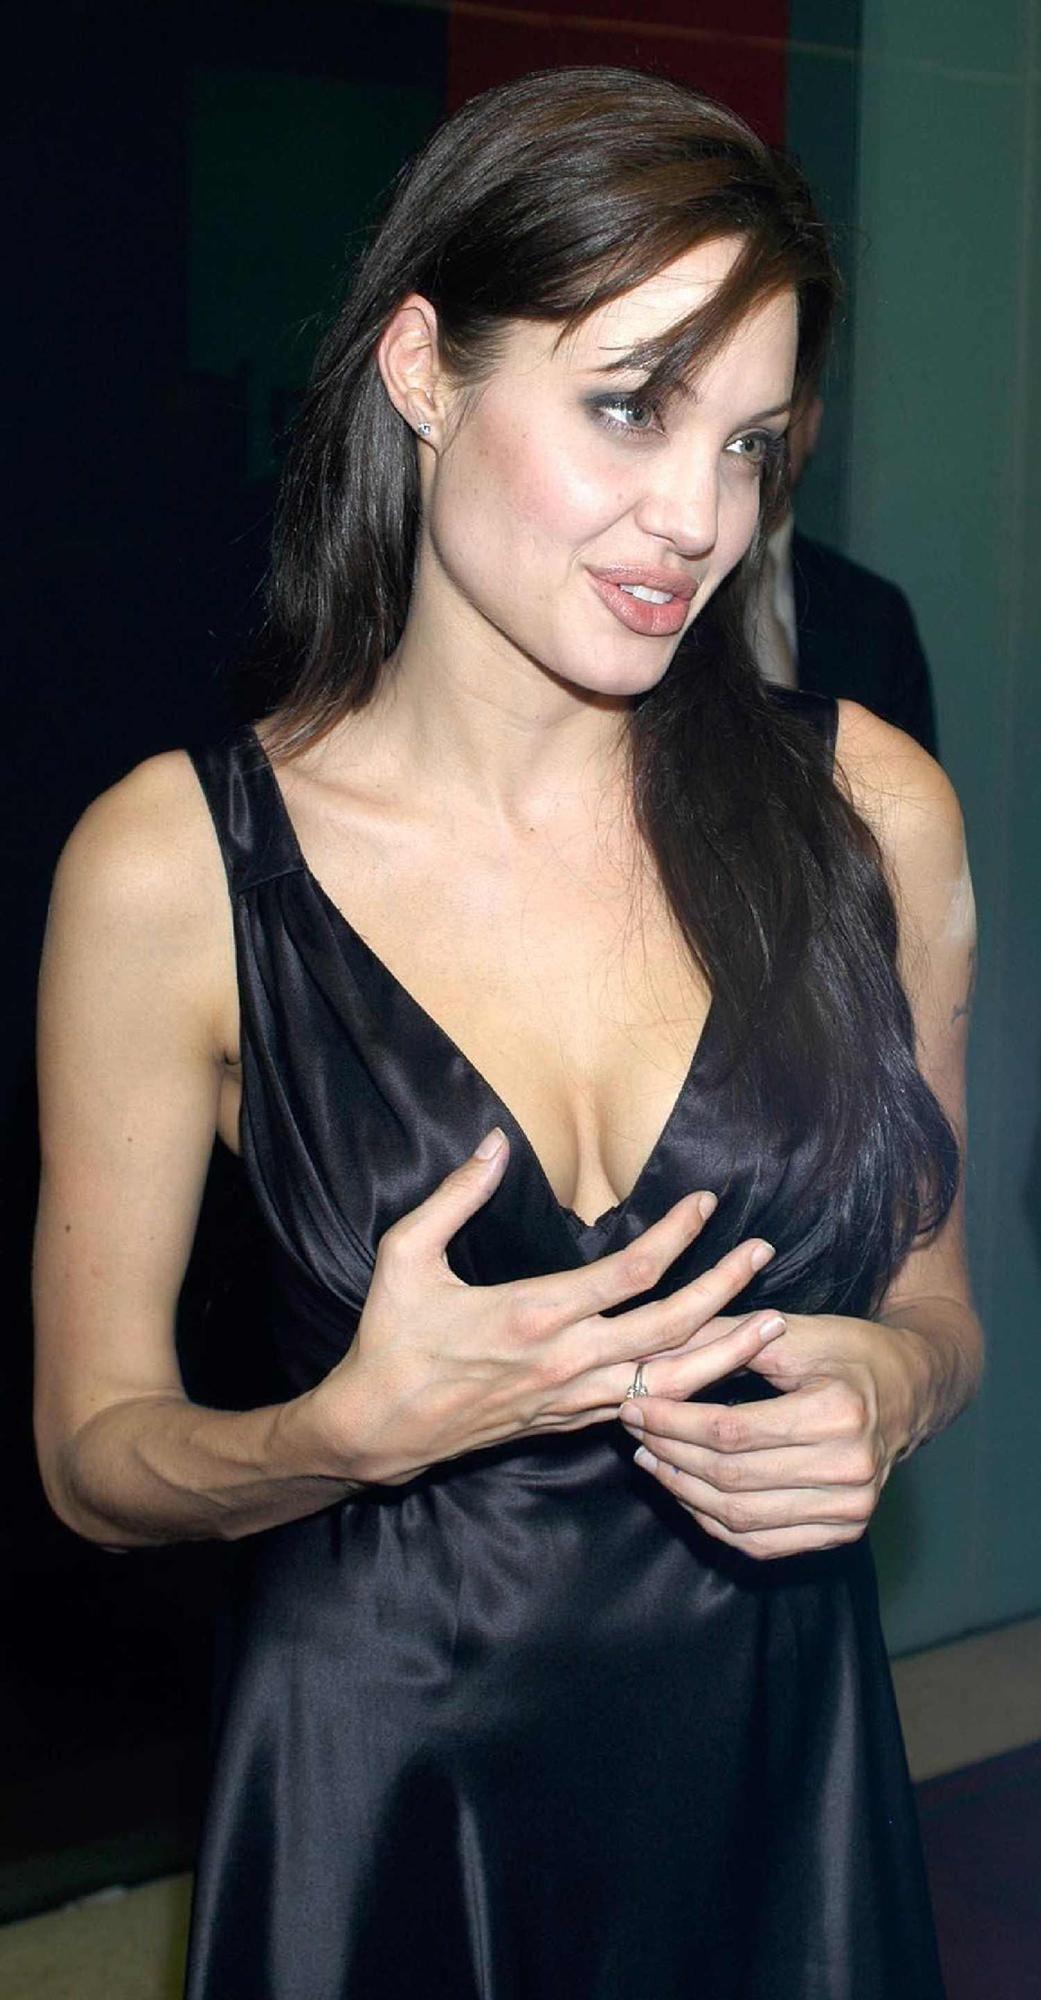 Sideboobs Angelina Jolie nudes (55 photo), Tits, Paparazzi, Boobs, underwear 2015